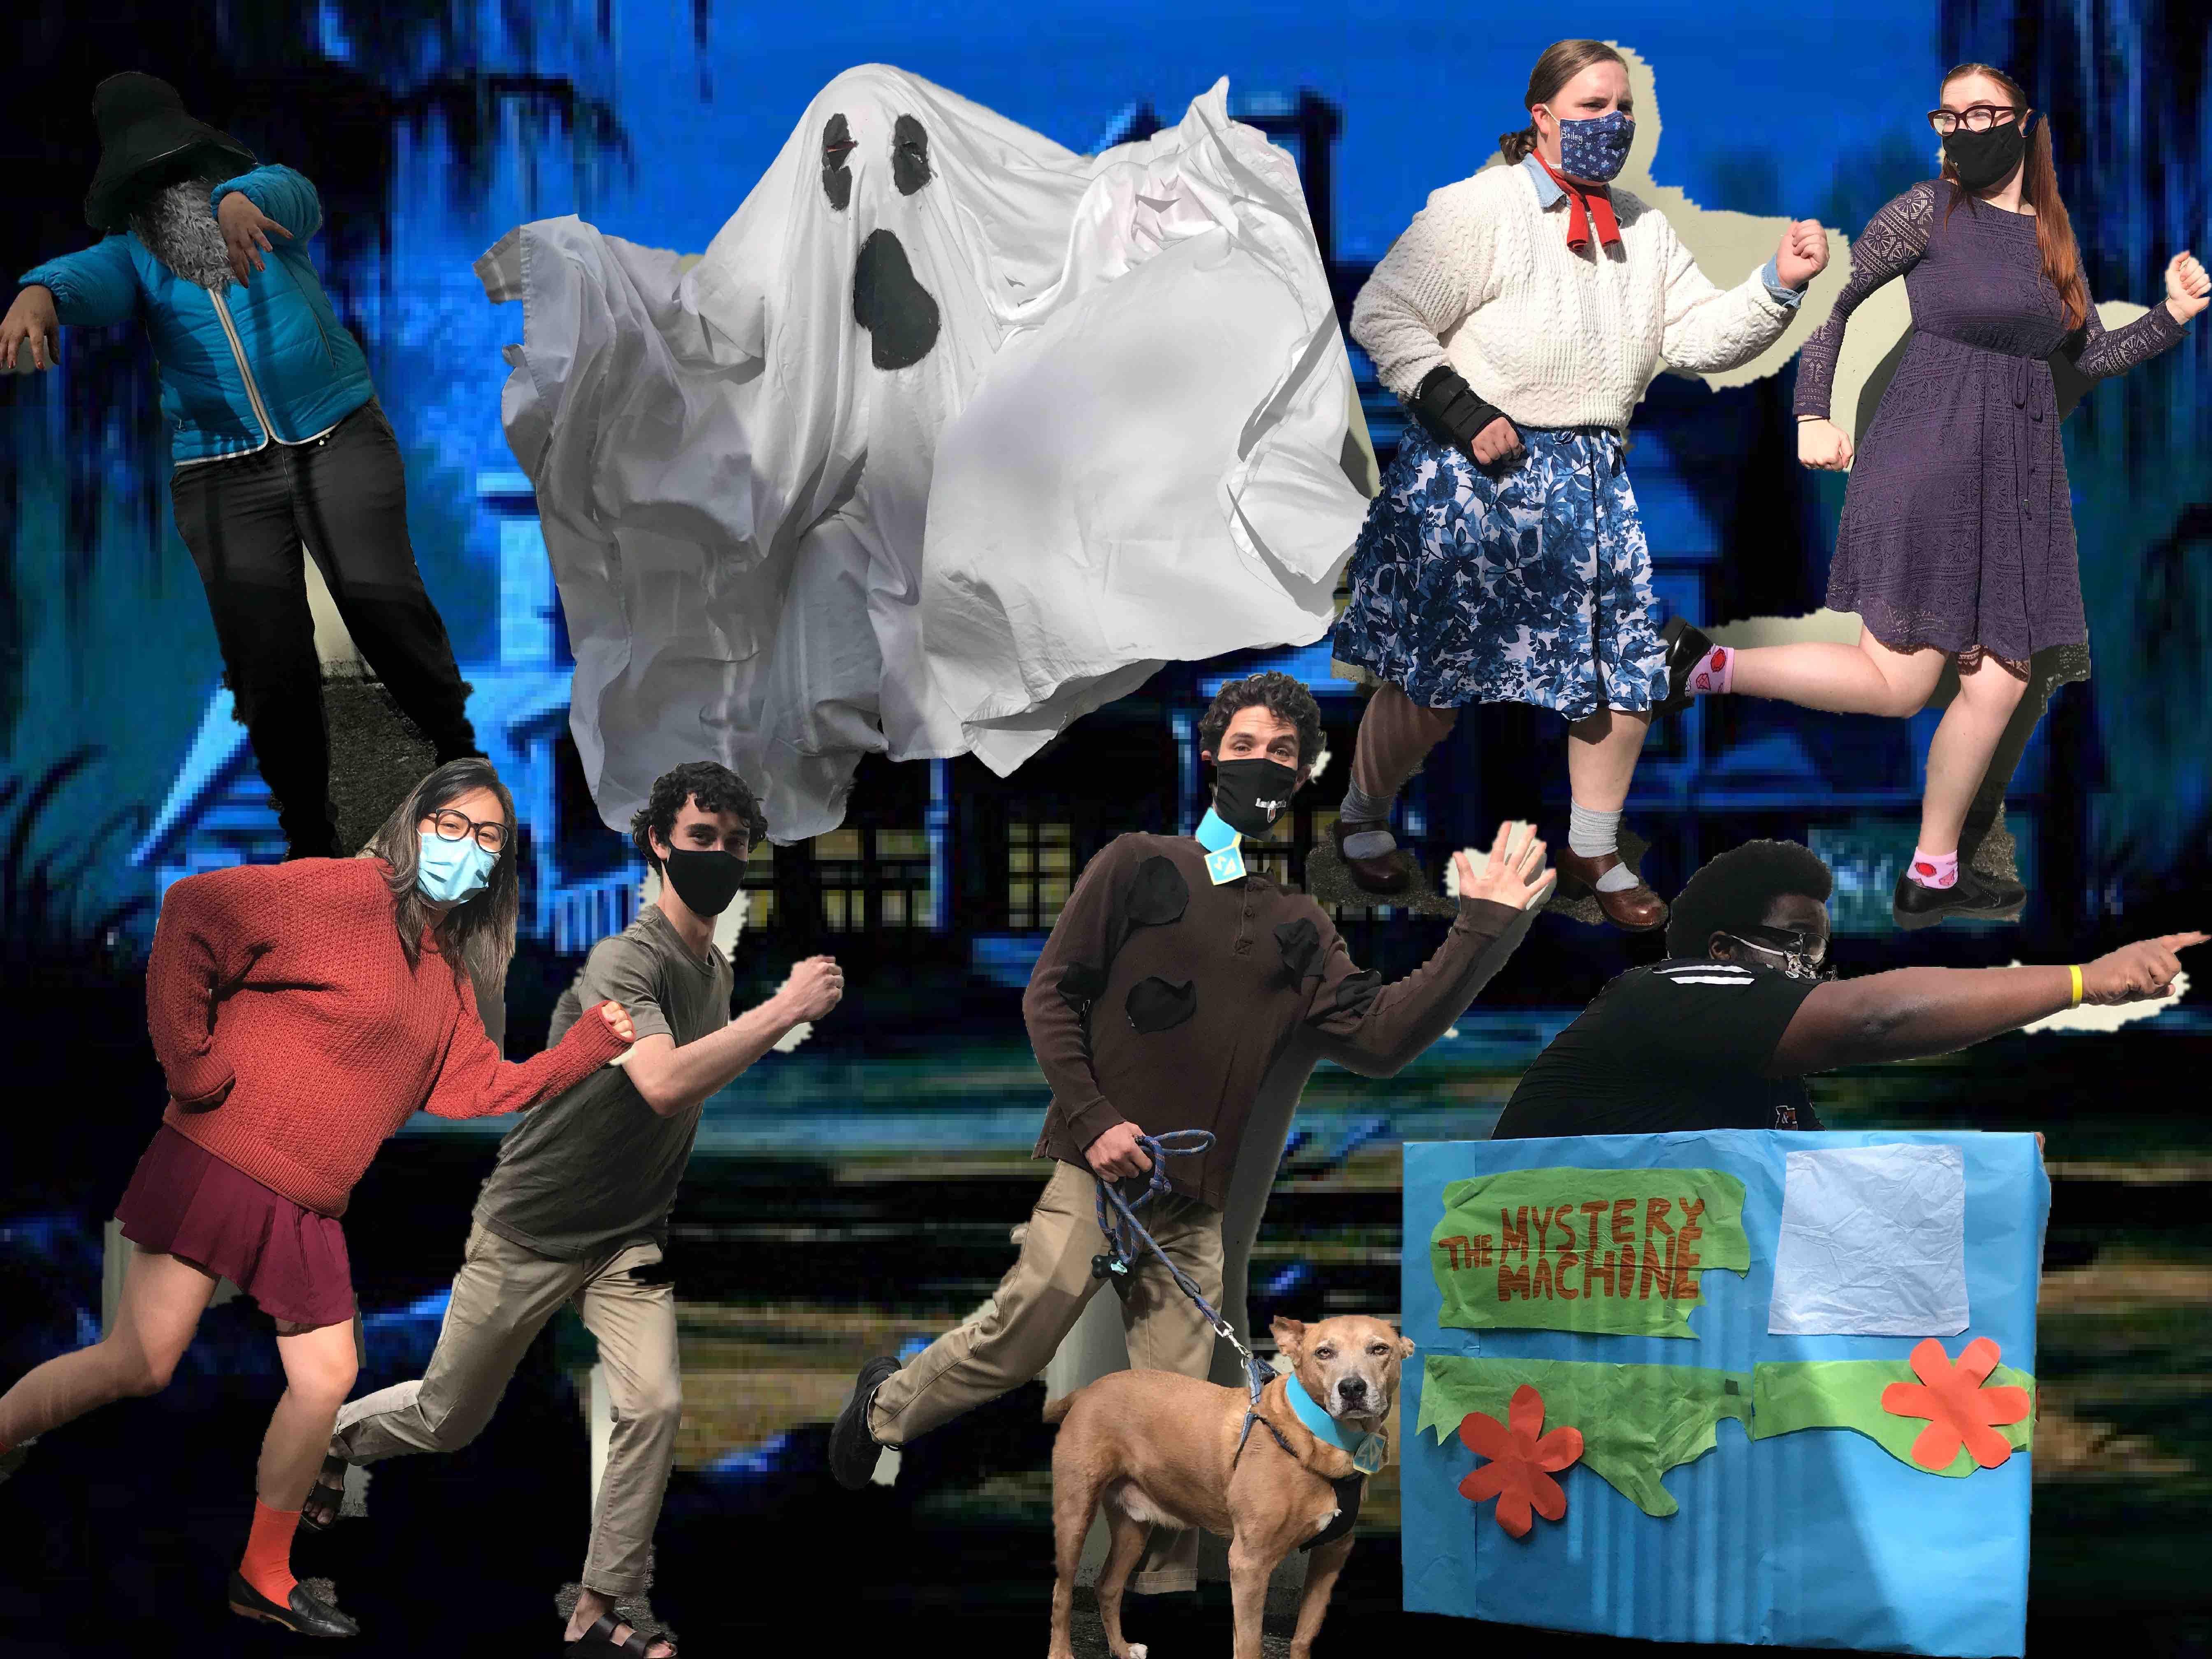 "2. ""The Scooby Gang!"" by Campus Living (Malavika Arun, Juliane Carla Corpus, Bailey Titus, Franchesca Spann, Arielle Valdez, Cody Riggs, Joseph Fastuca (and Kenny the dog), Joe-Barry Gardner)"